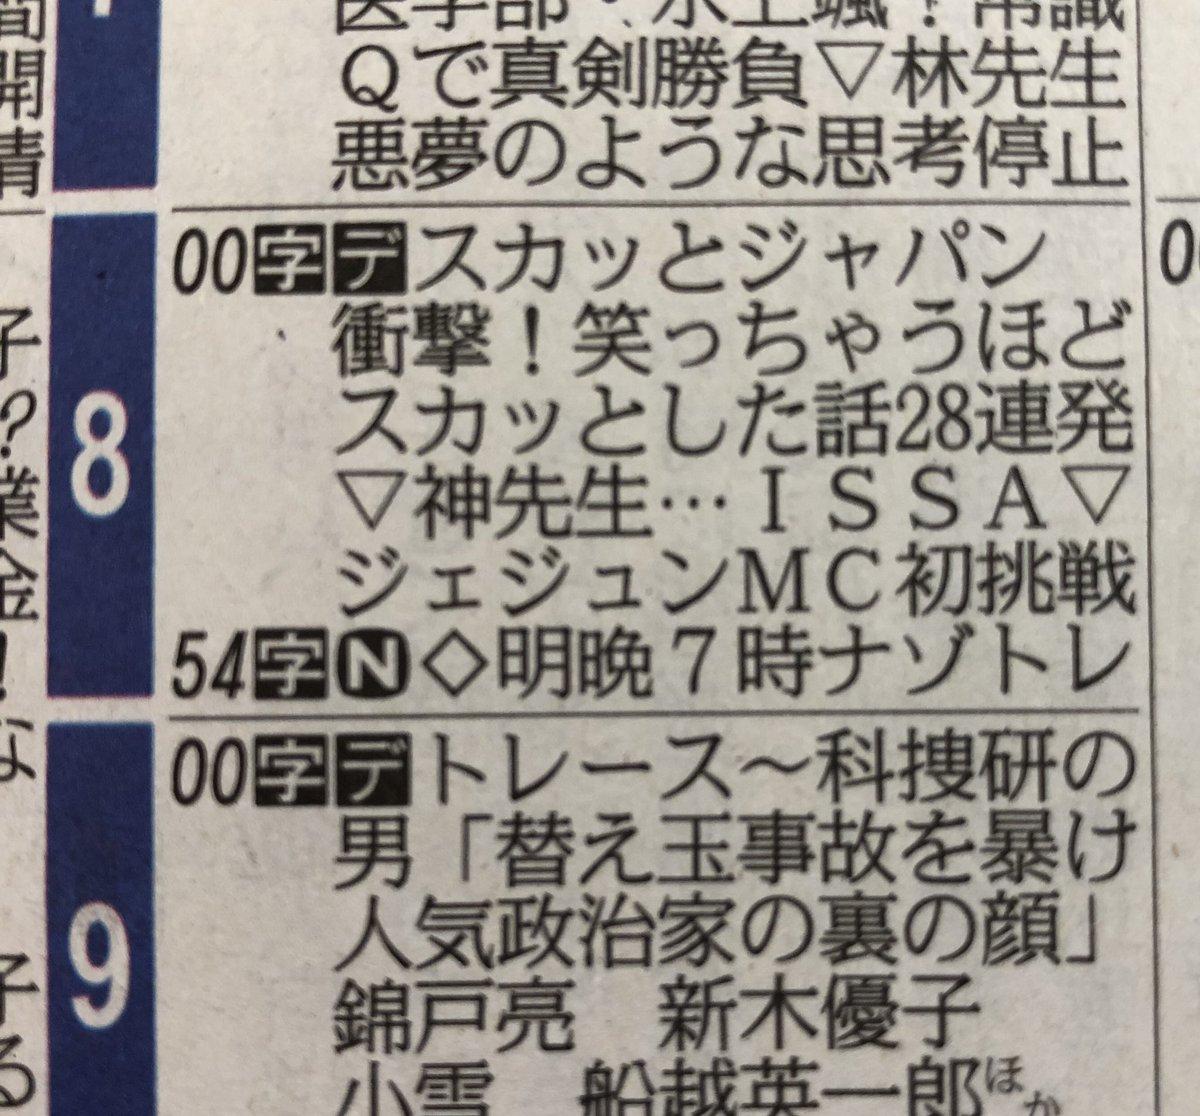 💜💜kyon💜💜's photo on #スカッとジャパン